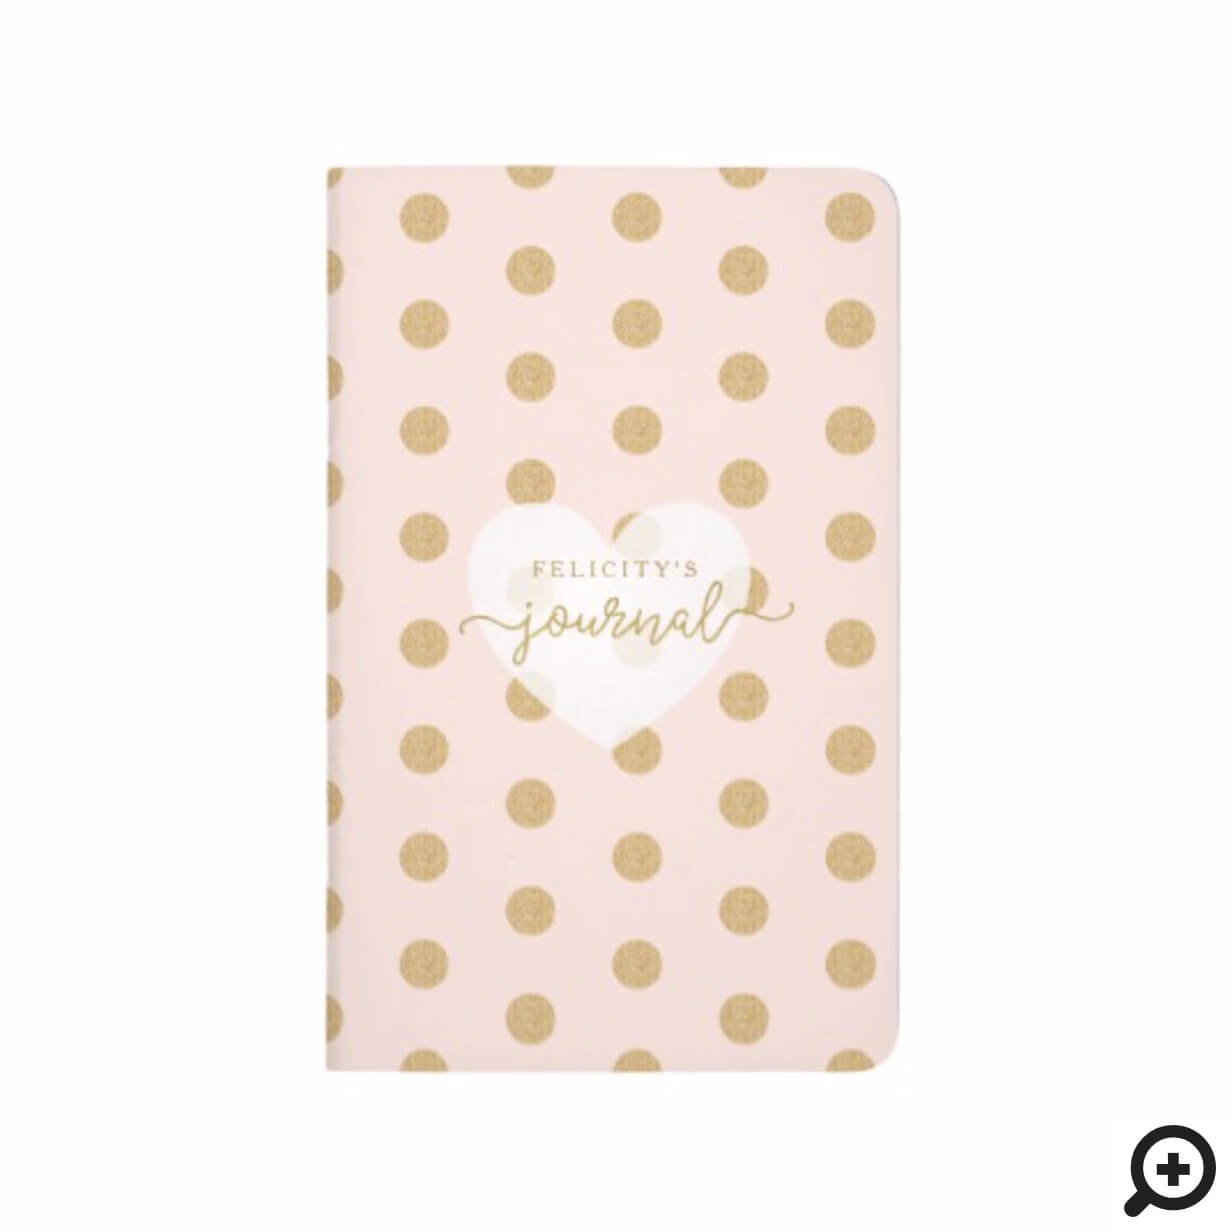 Chic Blush Pink & Gold Polka Dot Heart Monogram Journal